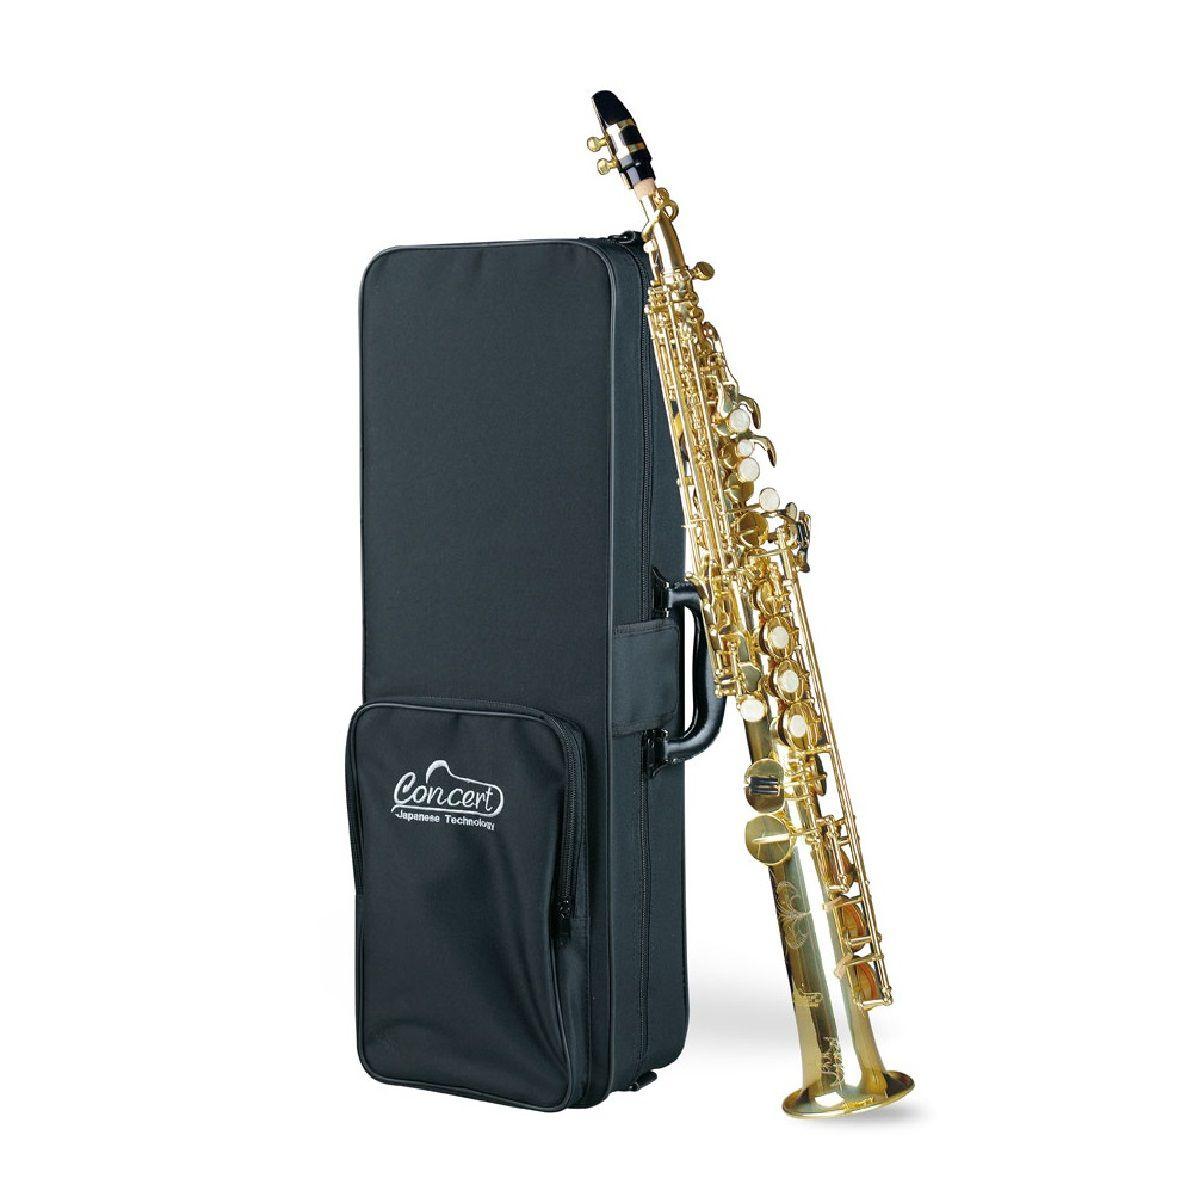 Saxofone Soprano Concert Css650 Com Estojo